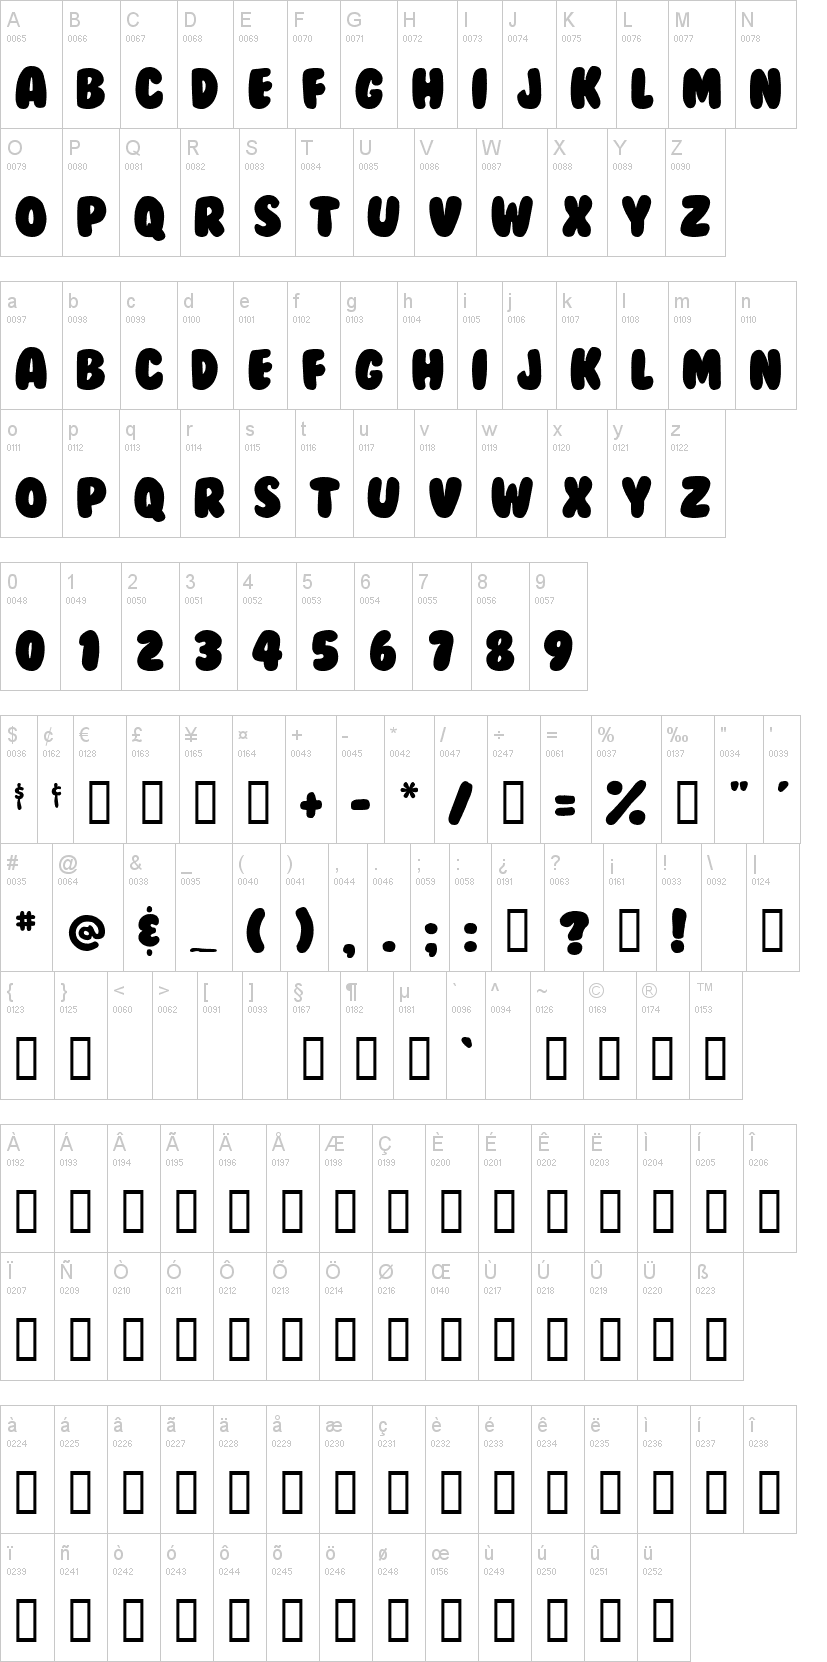 BubbleGum Font | dafon...